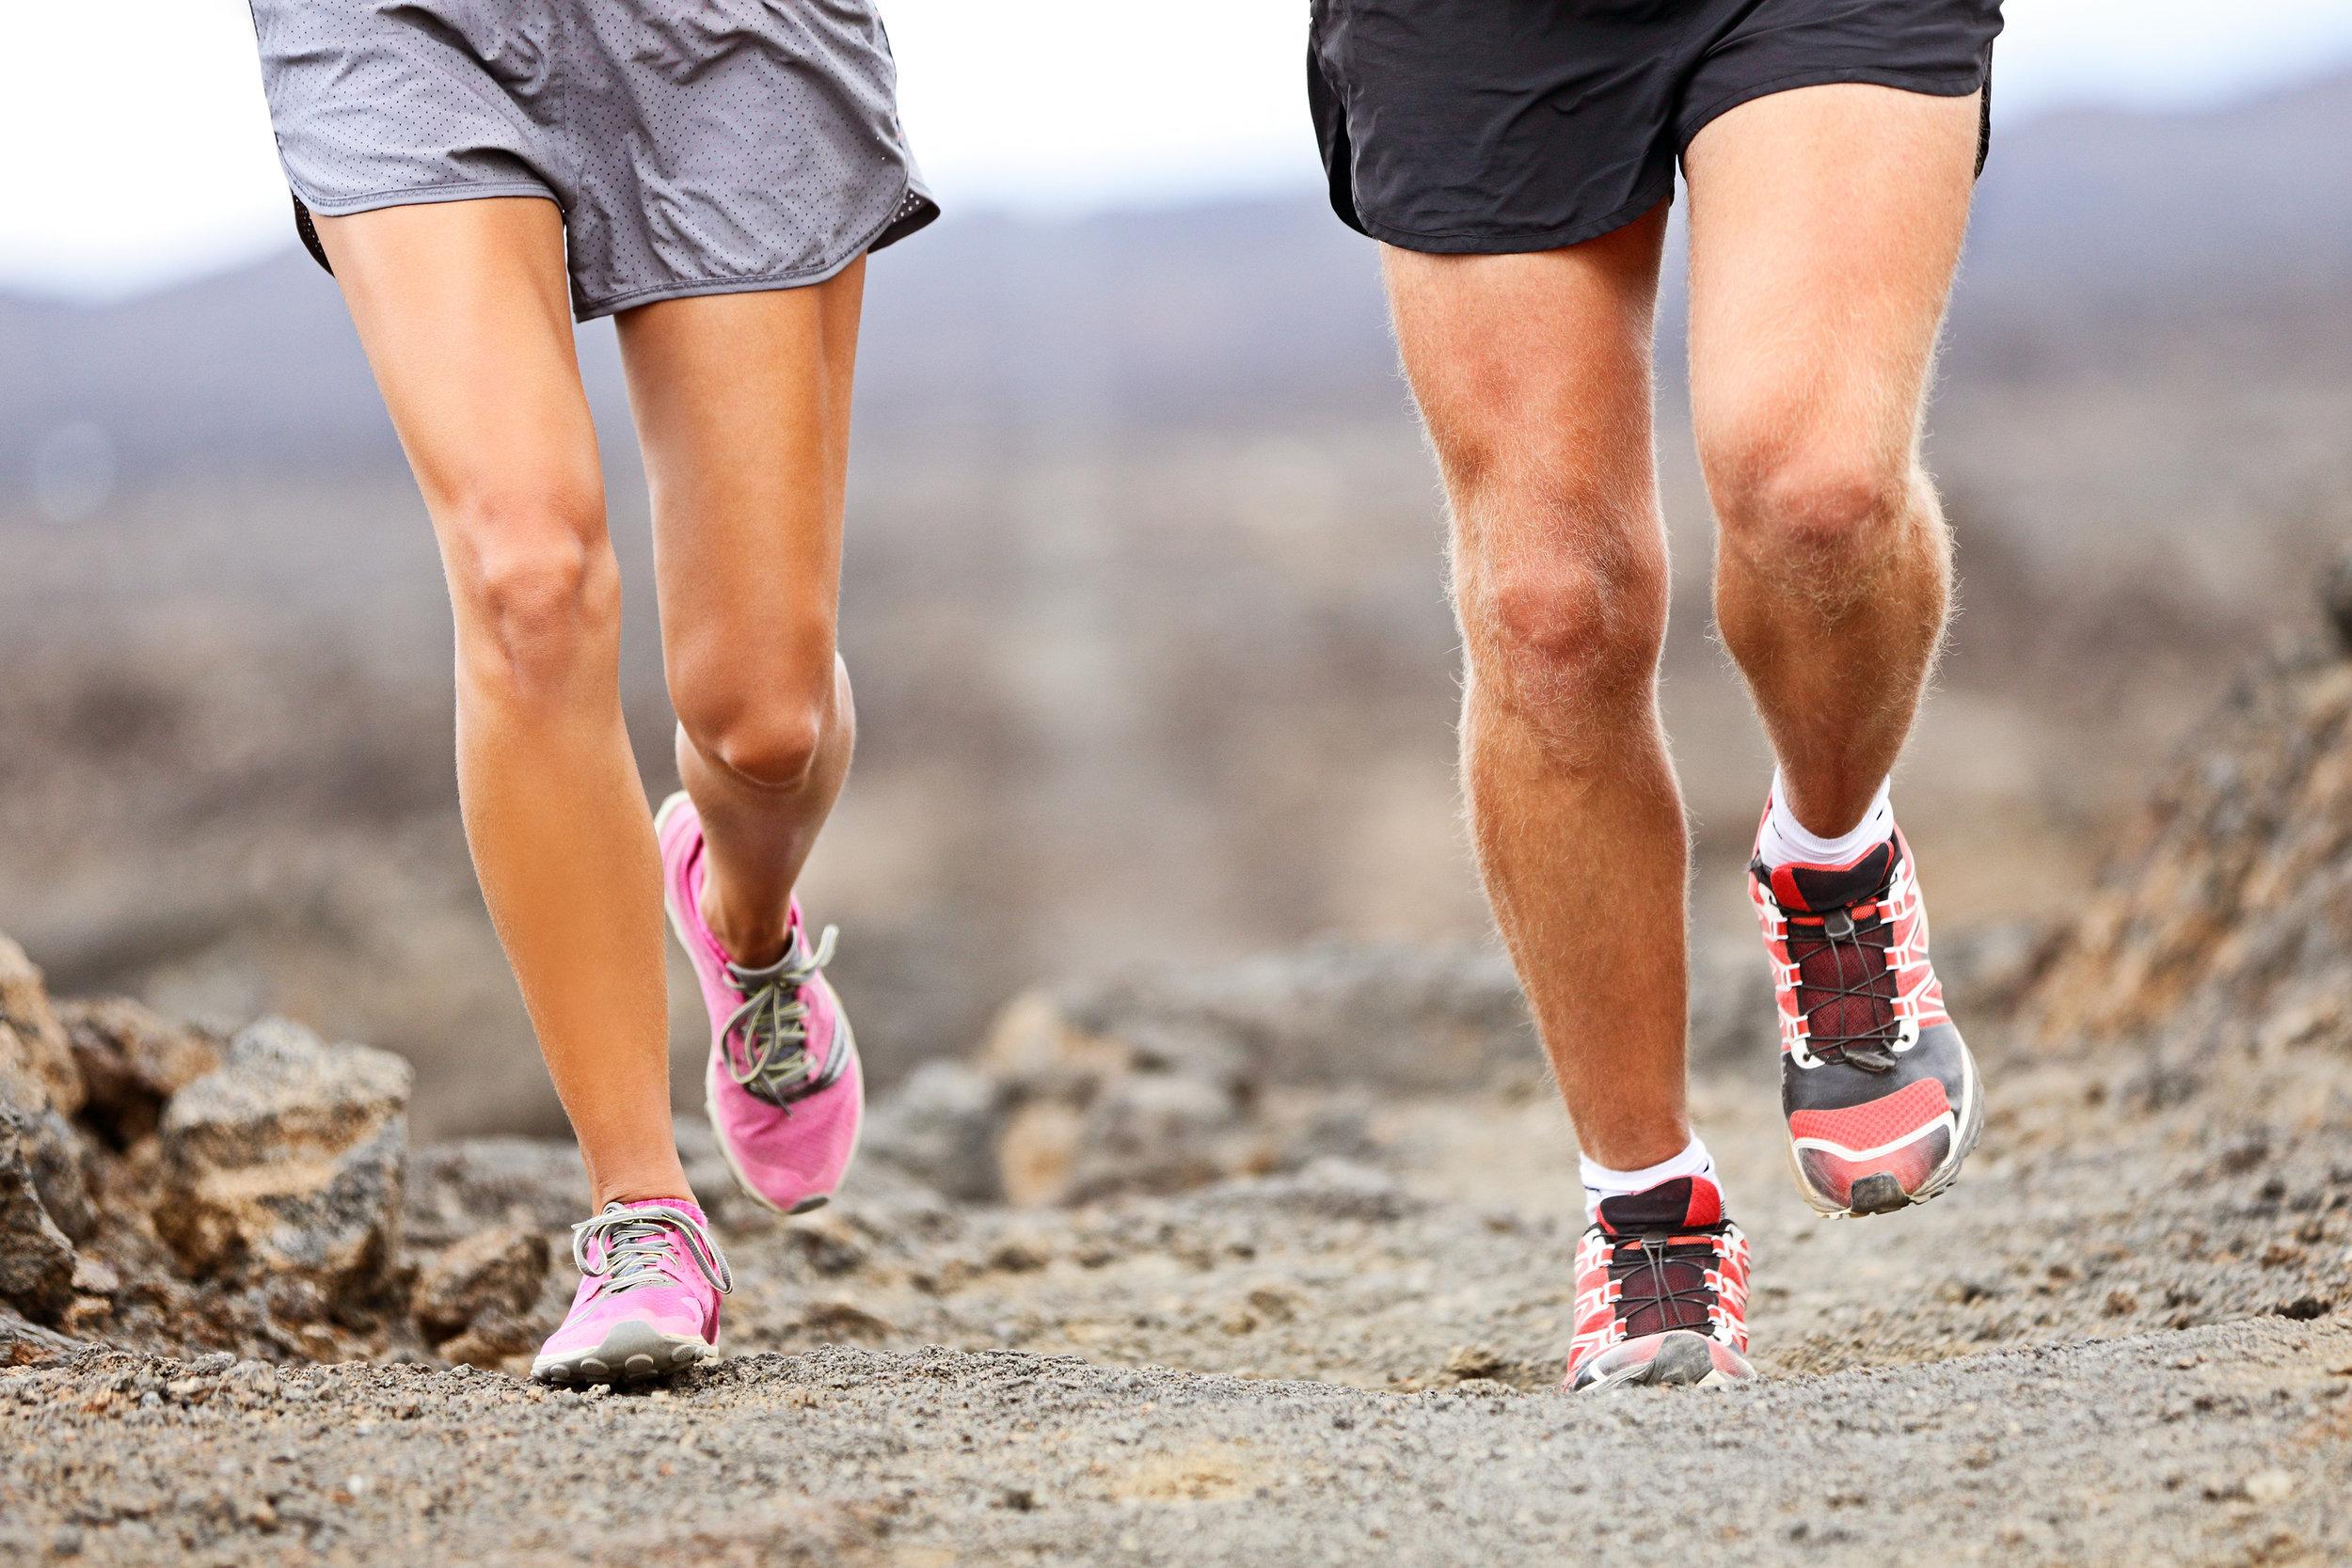 bigstock-Runners-running-shoes-on-trail-227561632.jpg